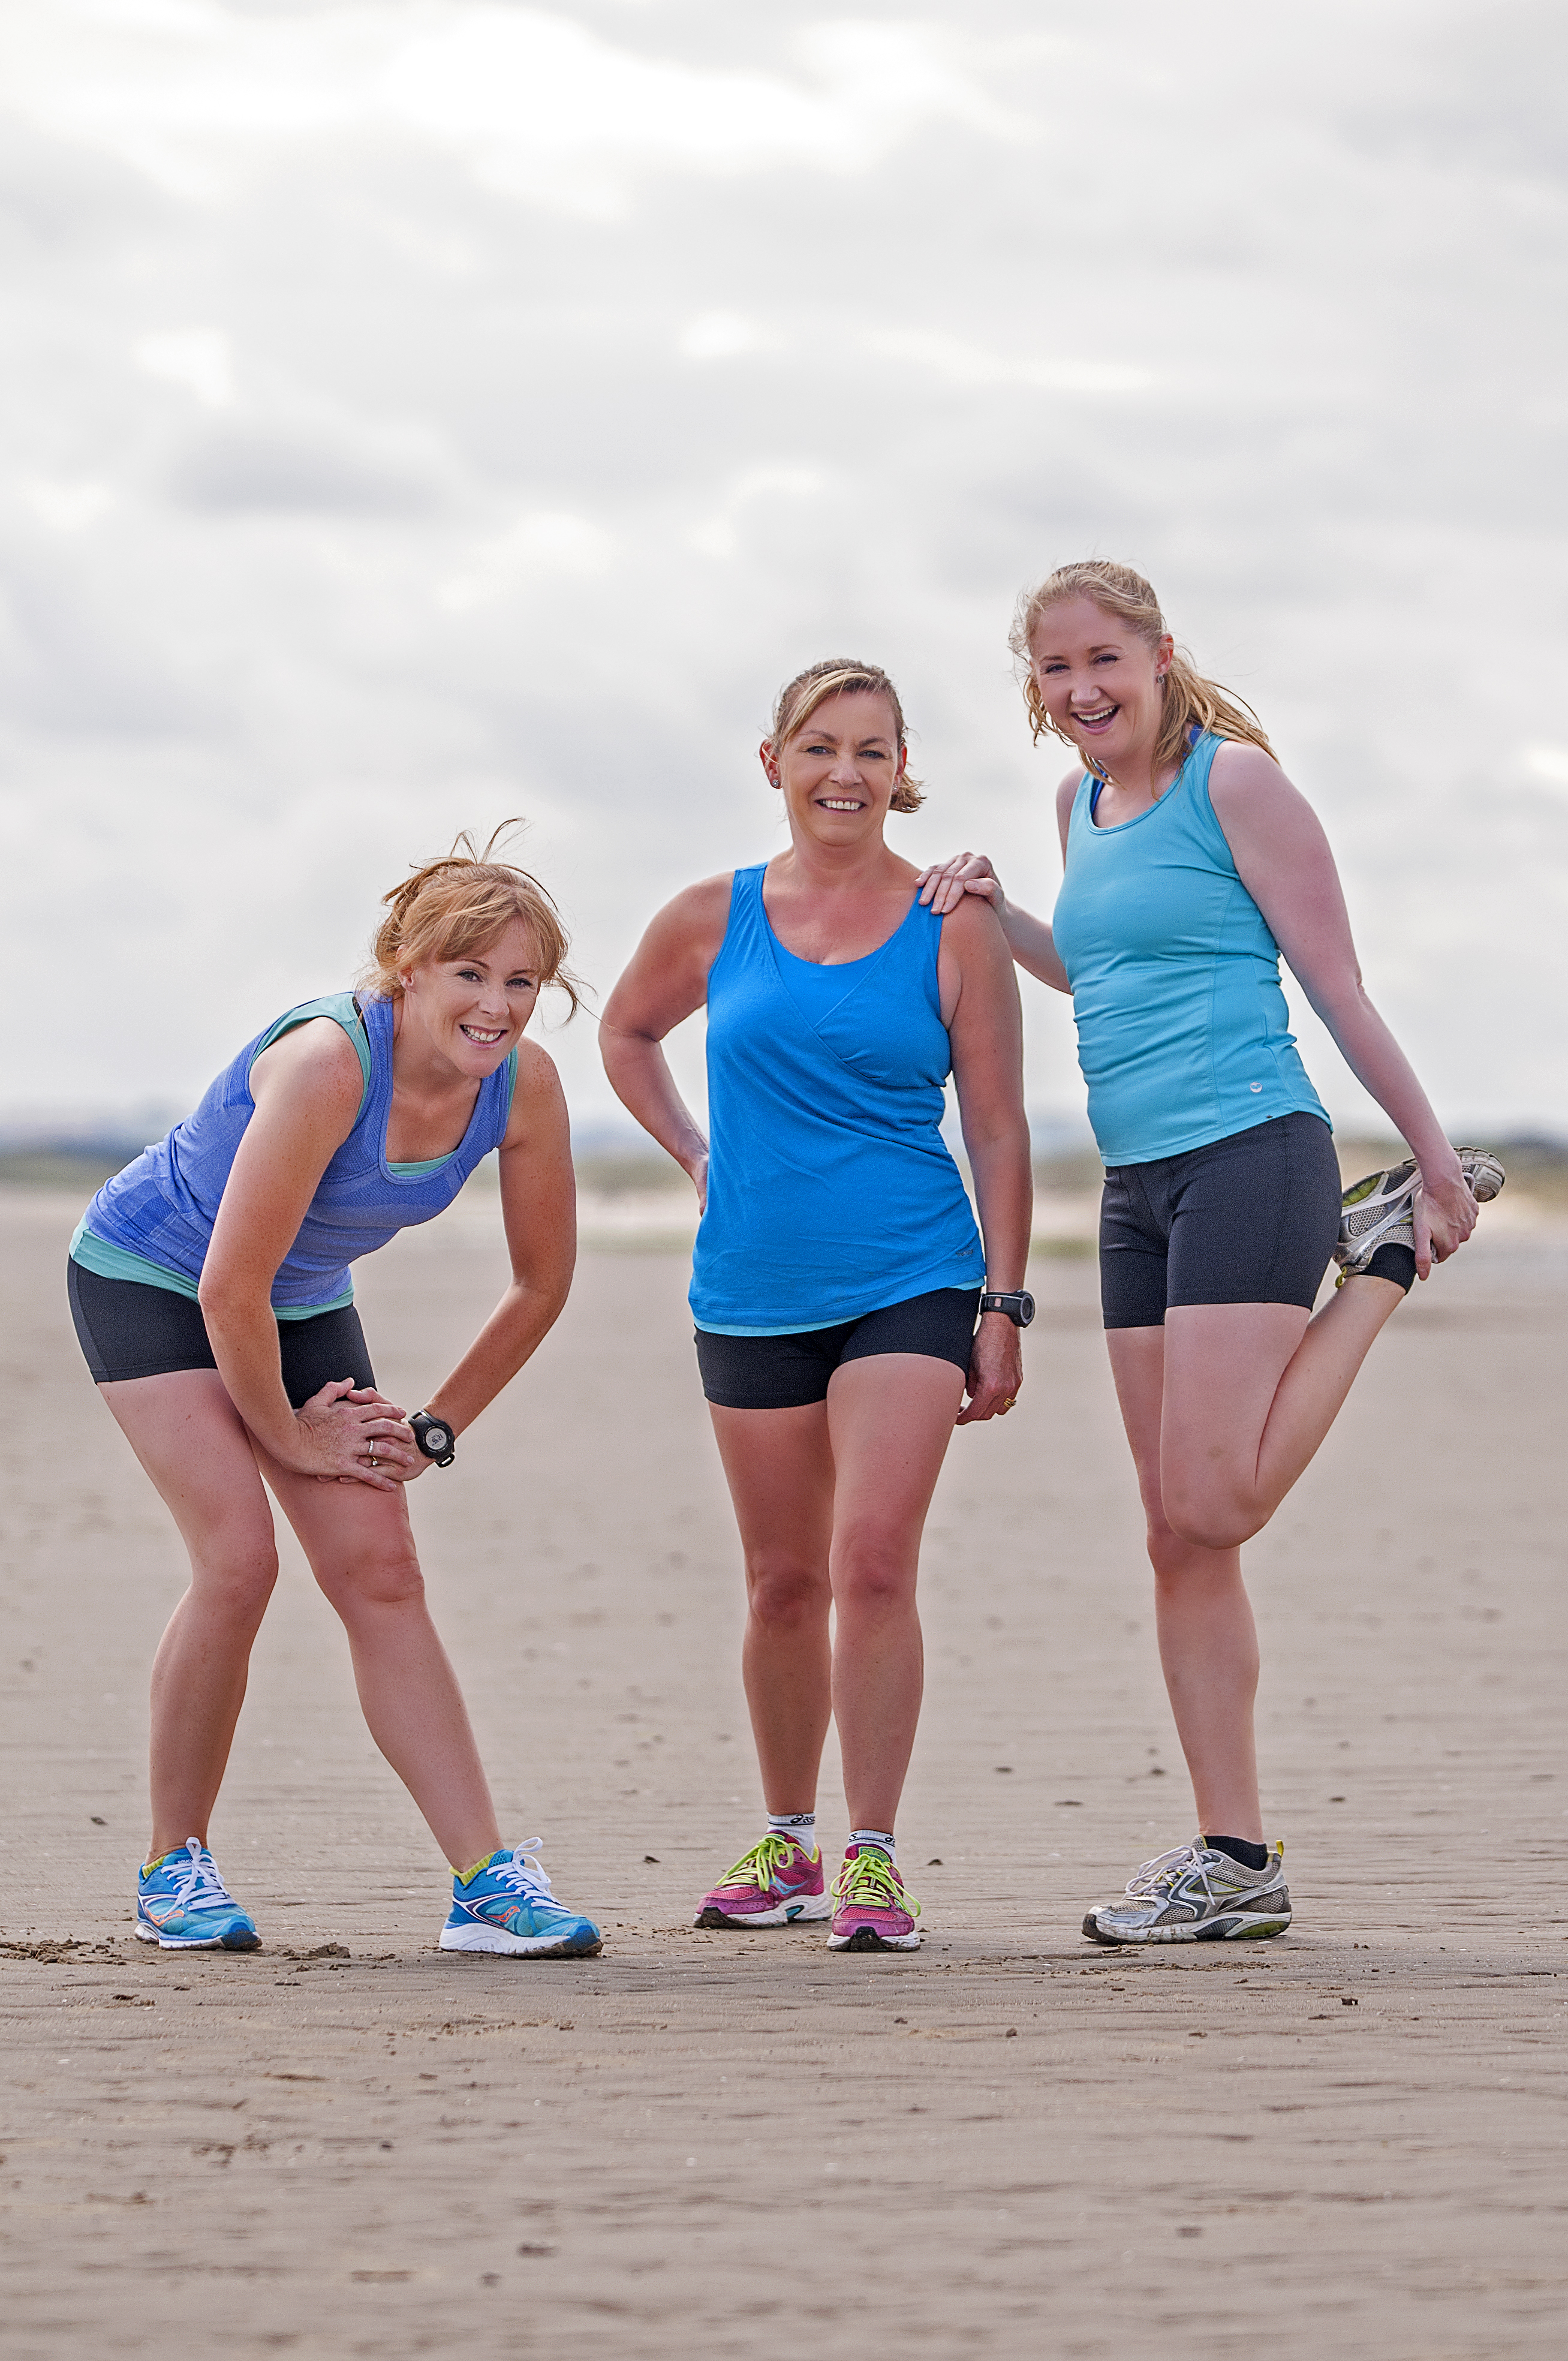 women fitness running health